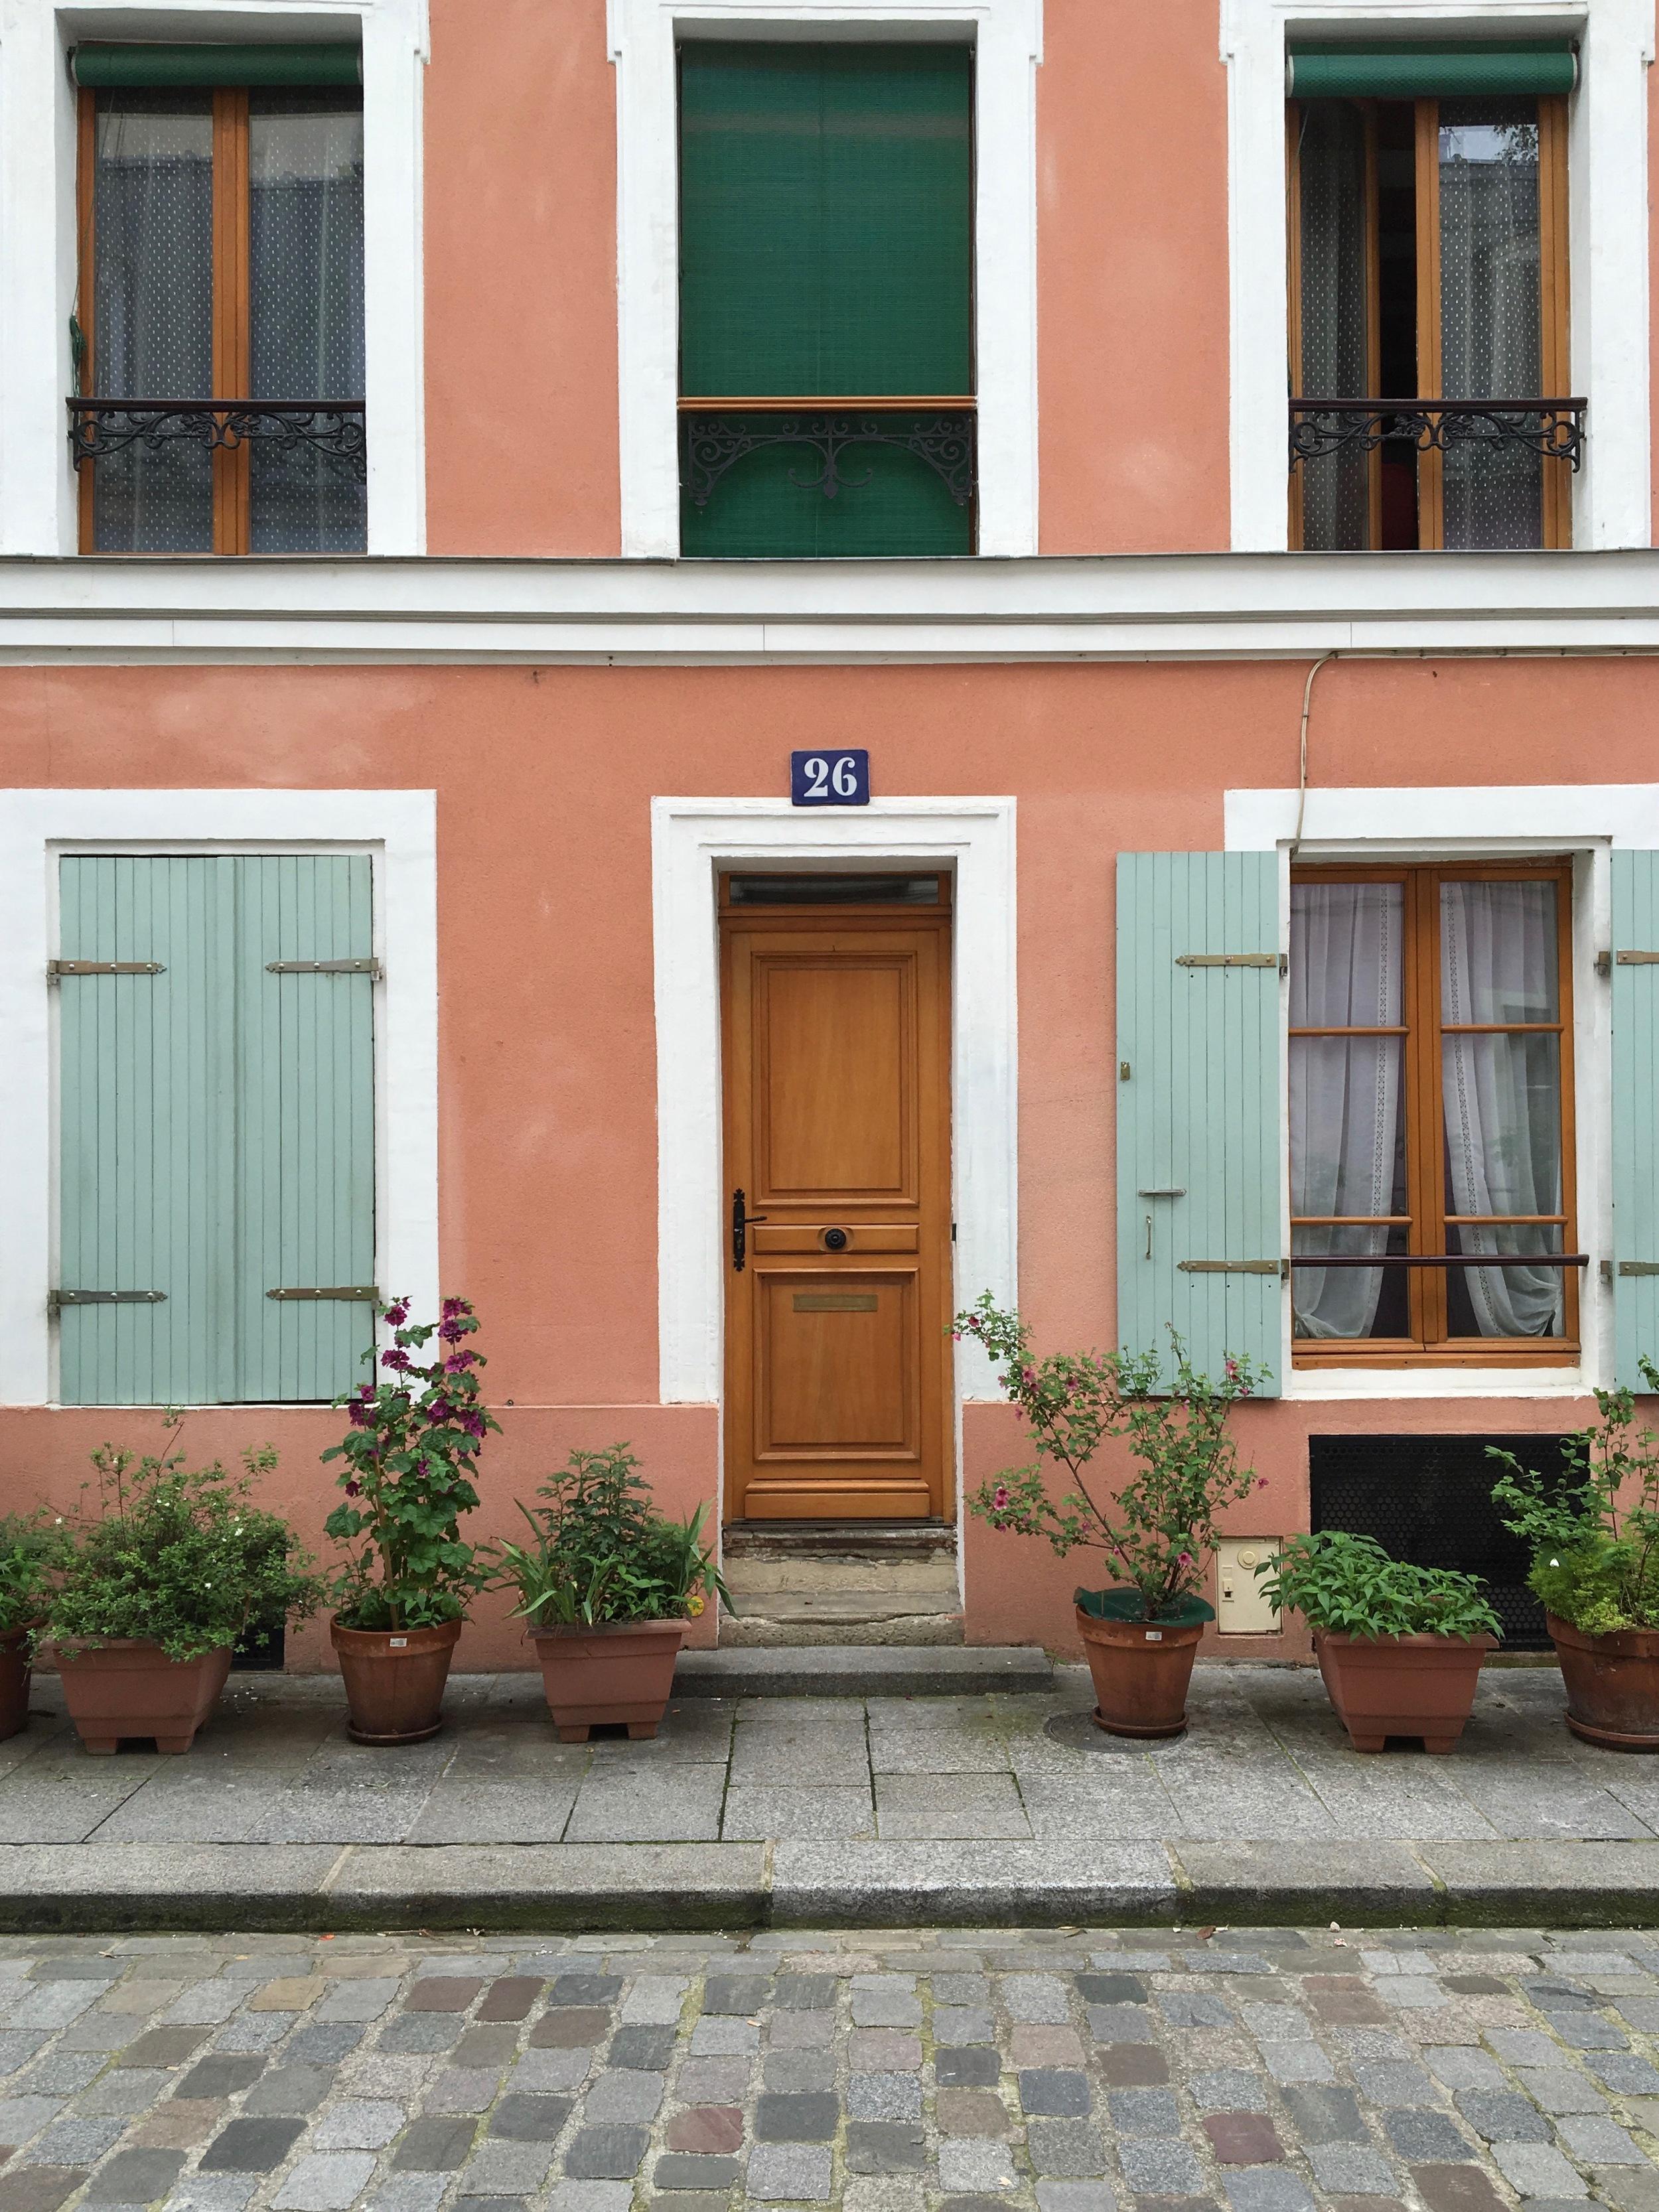 Dream house #2